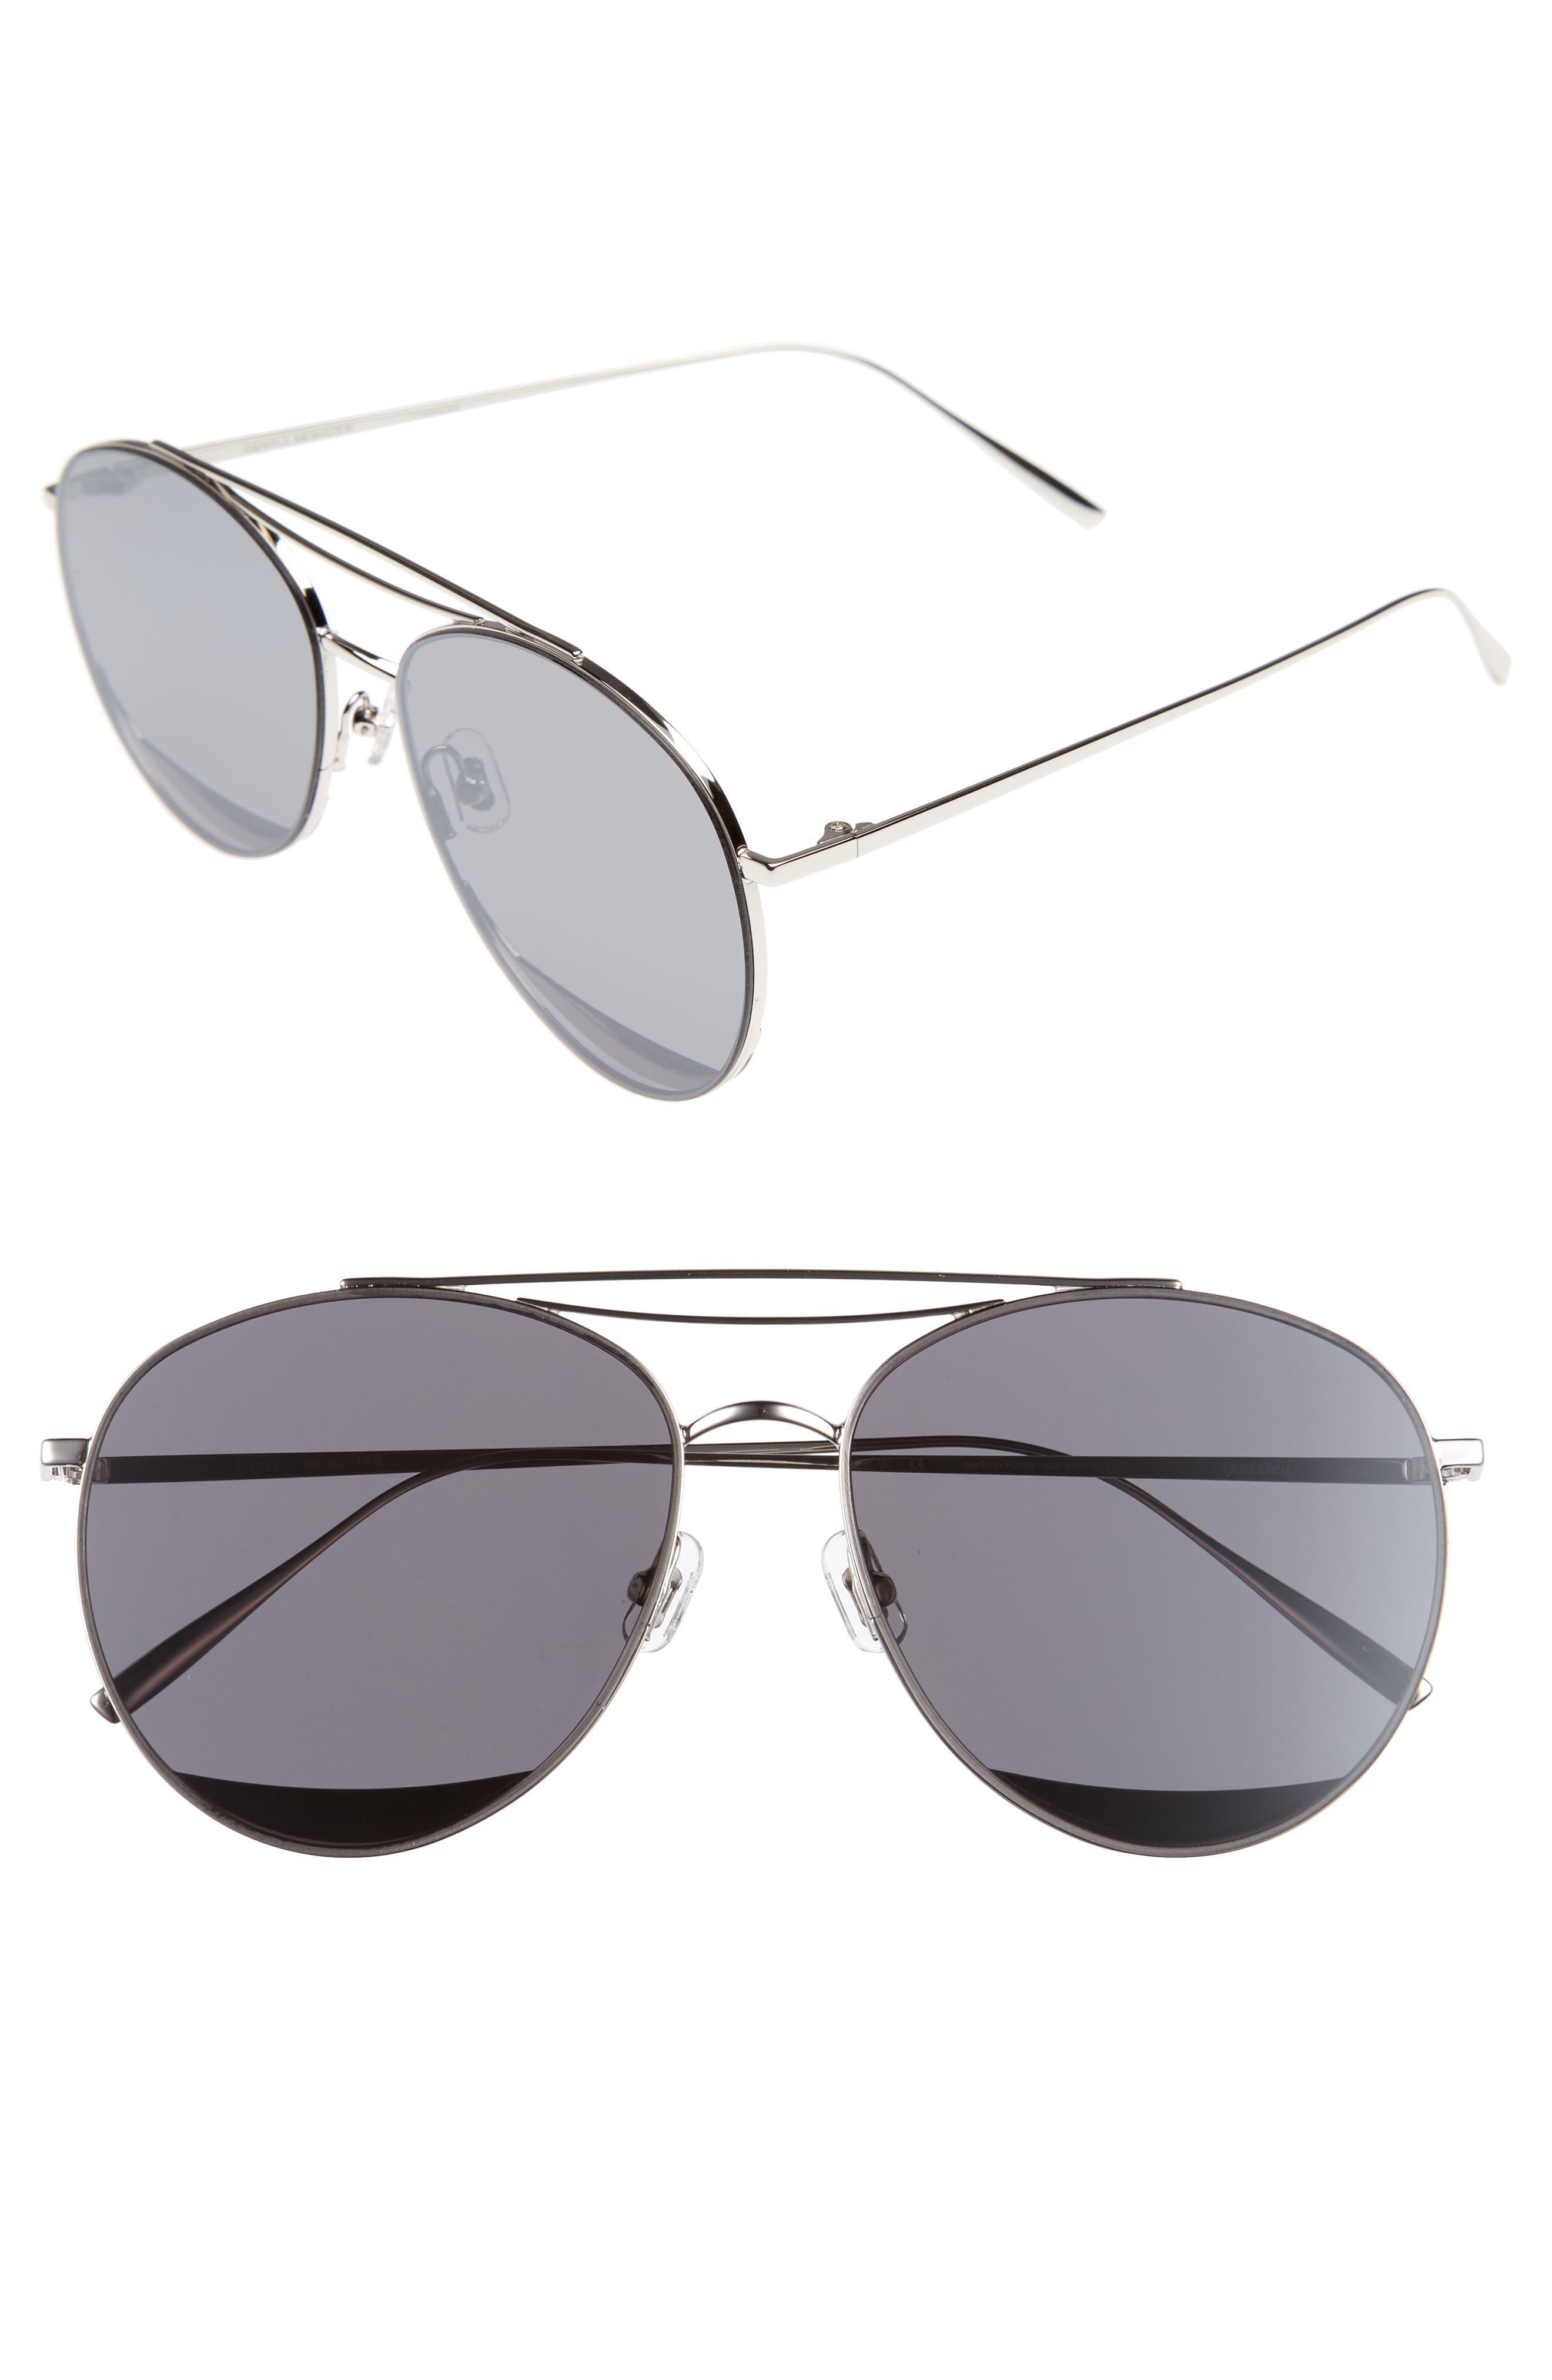 Odd Odd 61mm Aviator Sunglasses,                             Main thumbnail 1, color,                             040